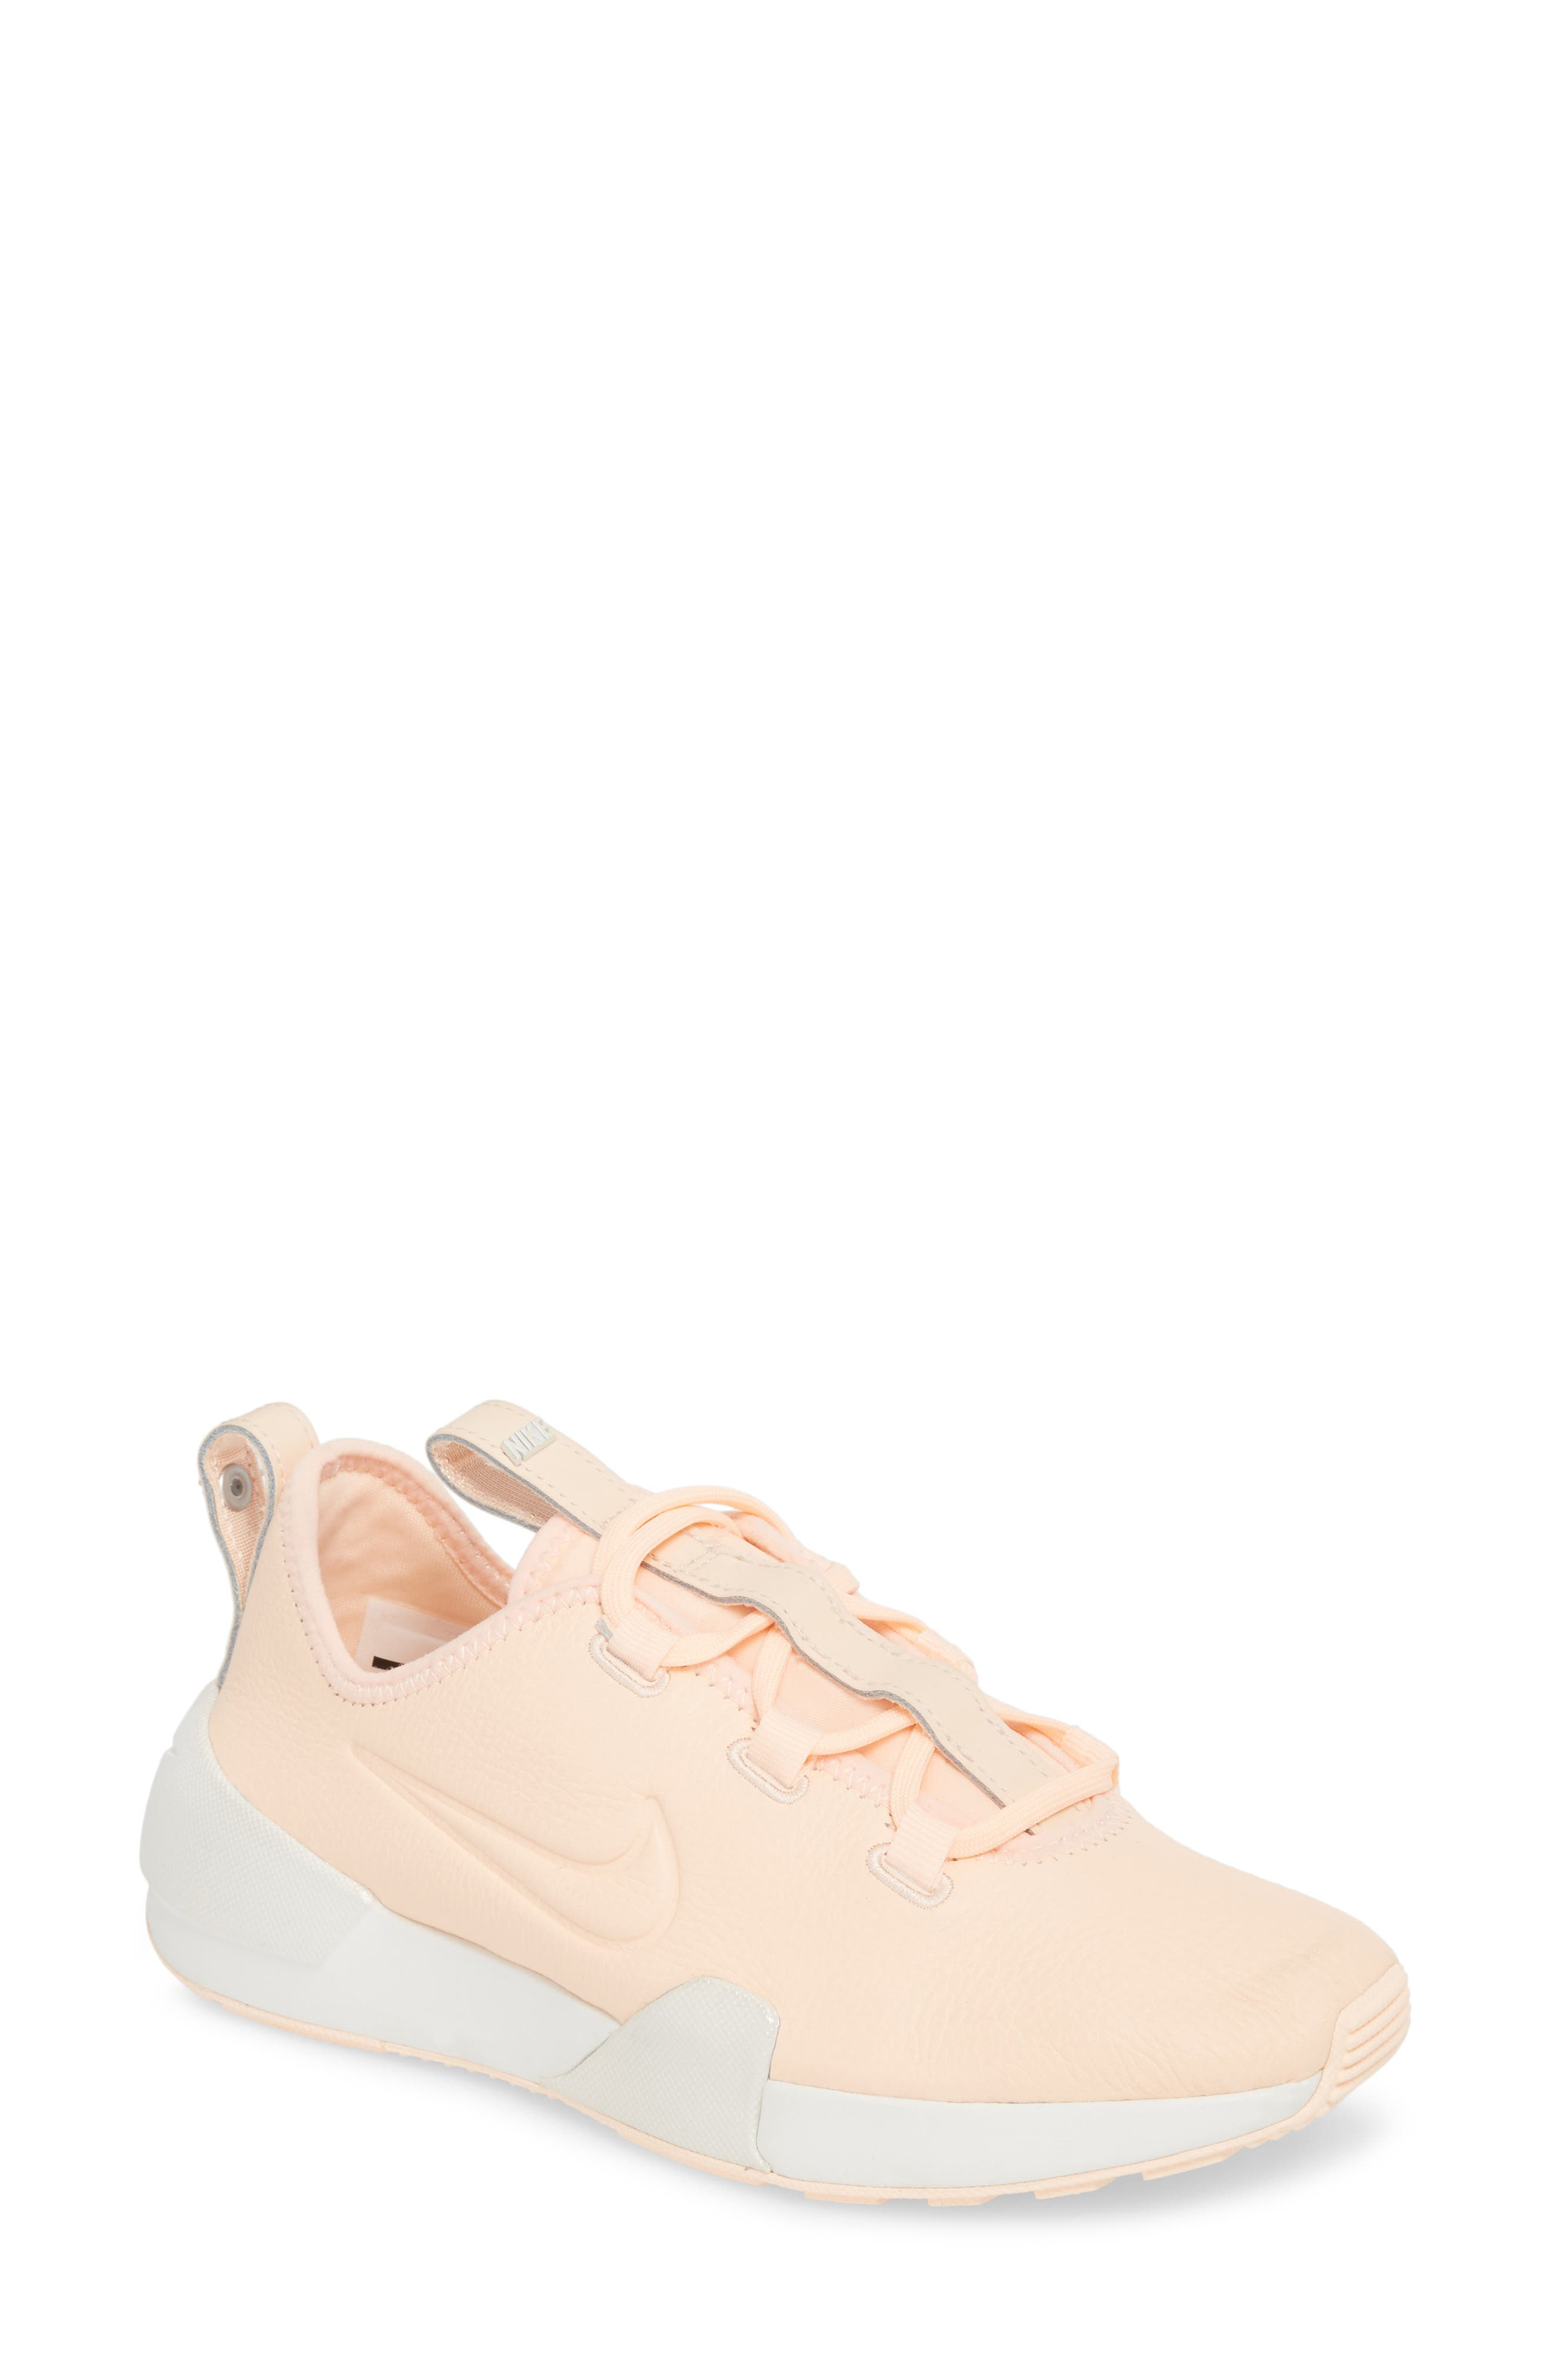 Nike Ashin Modern LX Sneaker (Women)